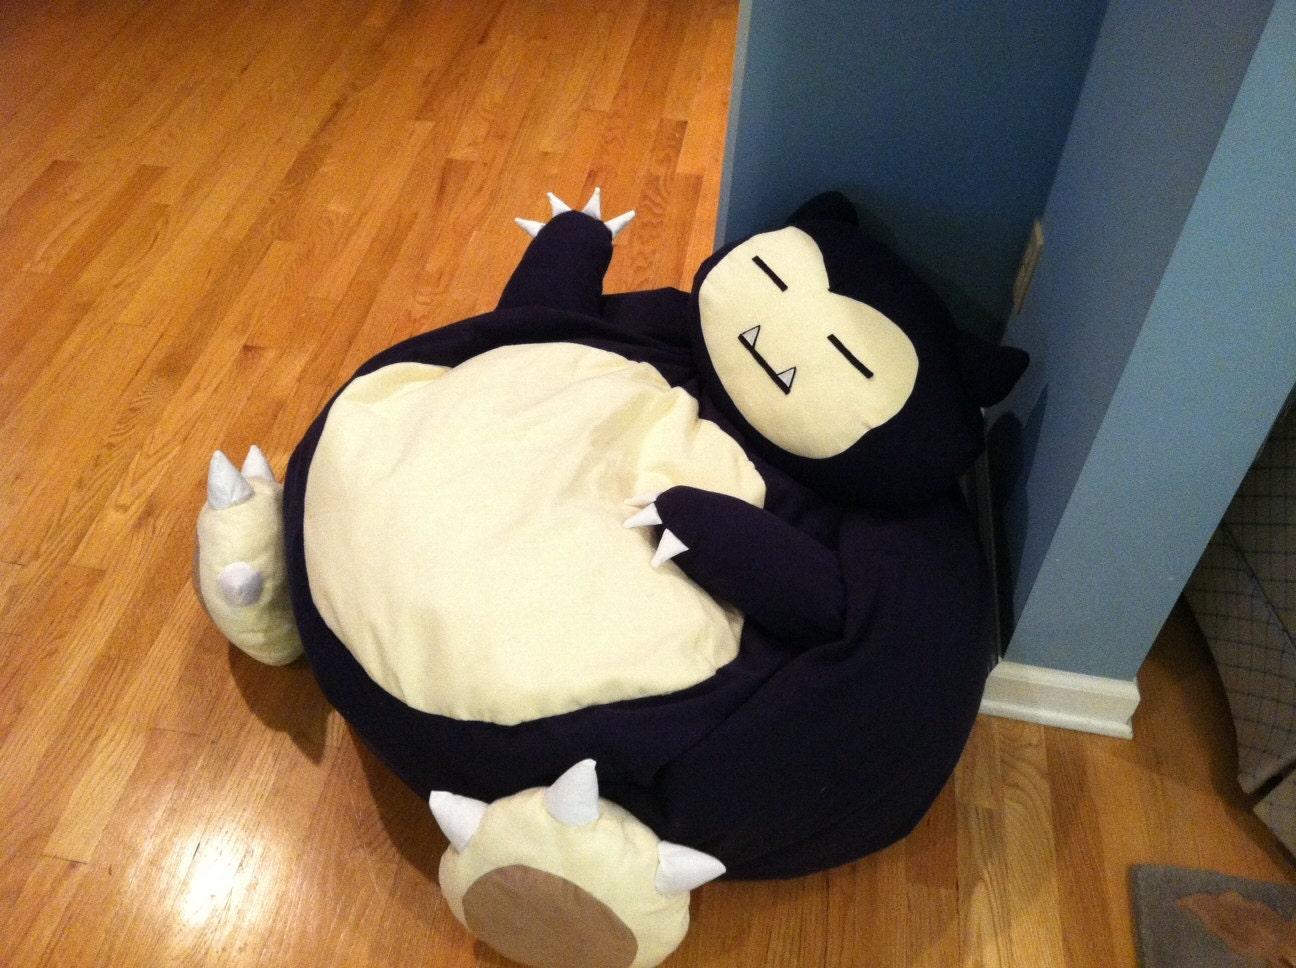 Snorlax Pokemon Full Size Bean Bag Chair